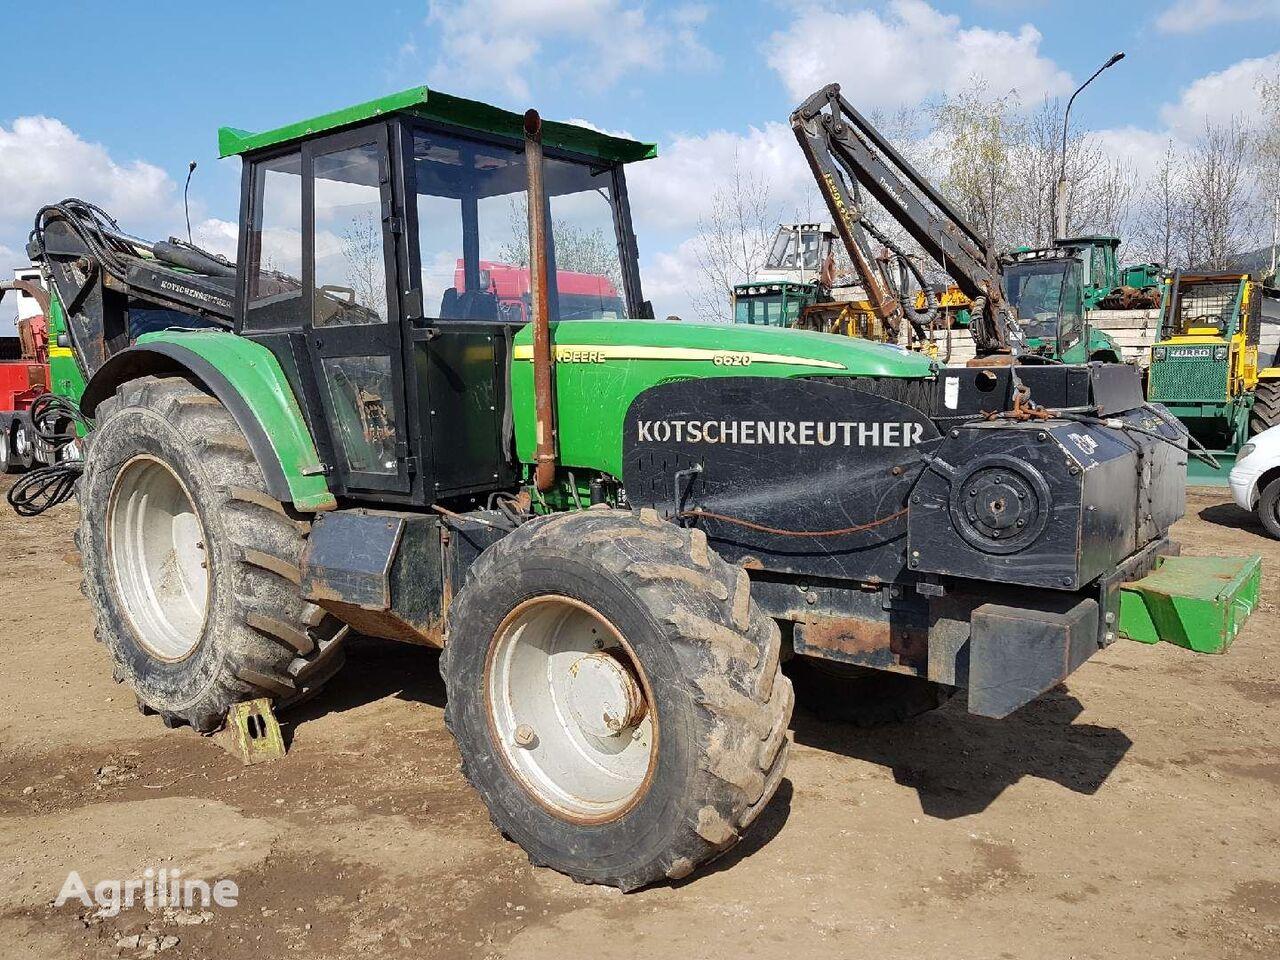 JOHN DEERE 6620 KOTSCHENREUTHER Forsttraktor